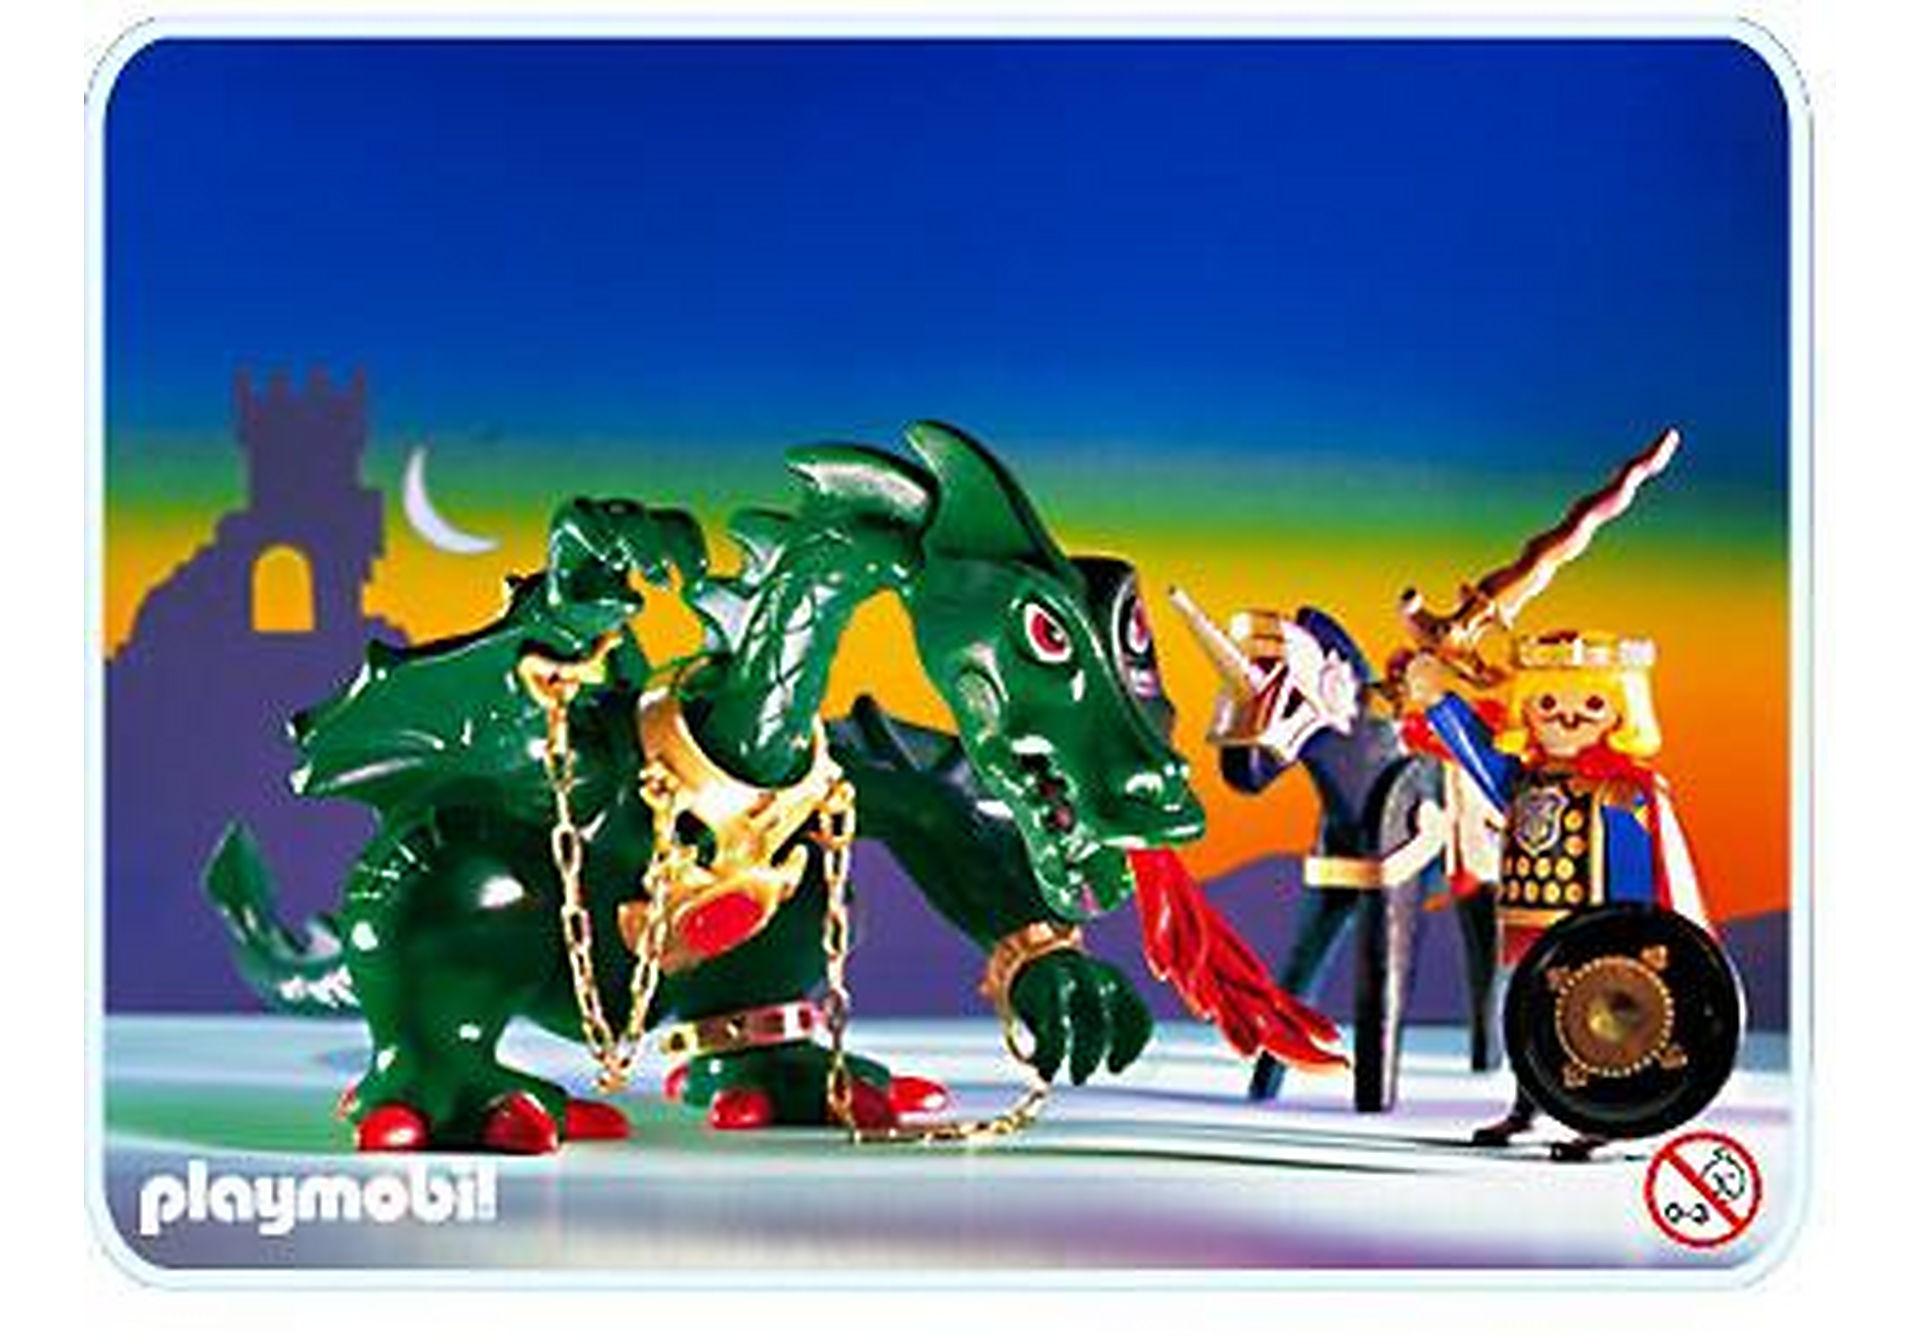 http://media.playmobil.com/i/playmobil/3840-A_product_detail/Drache